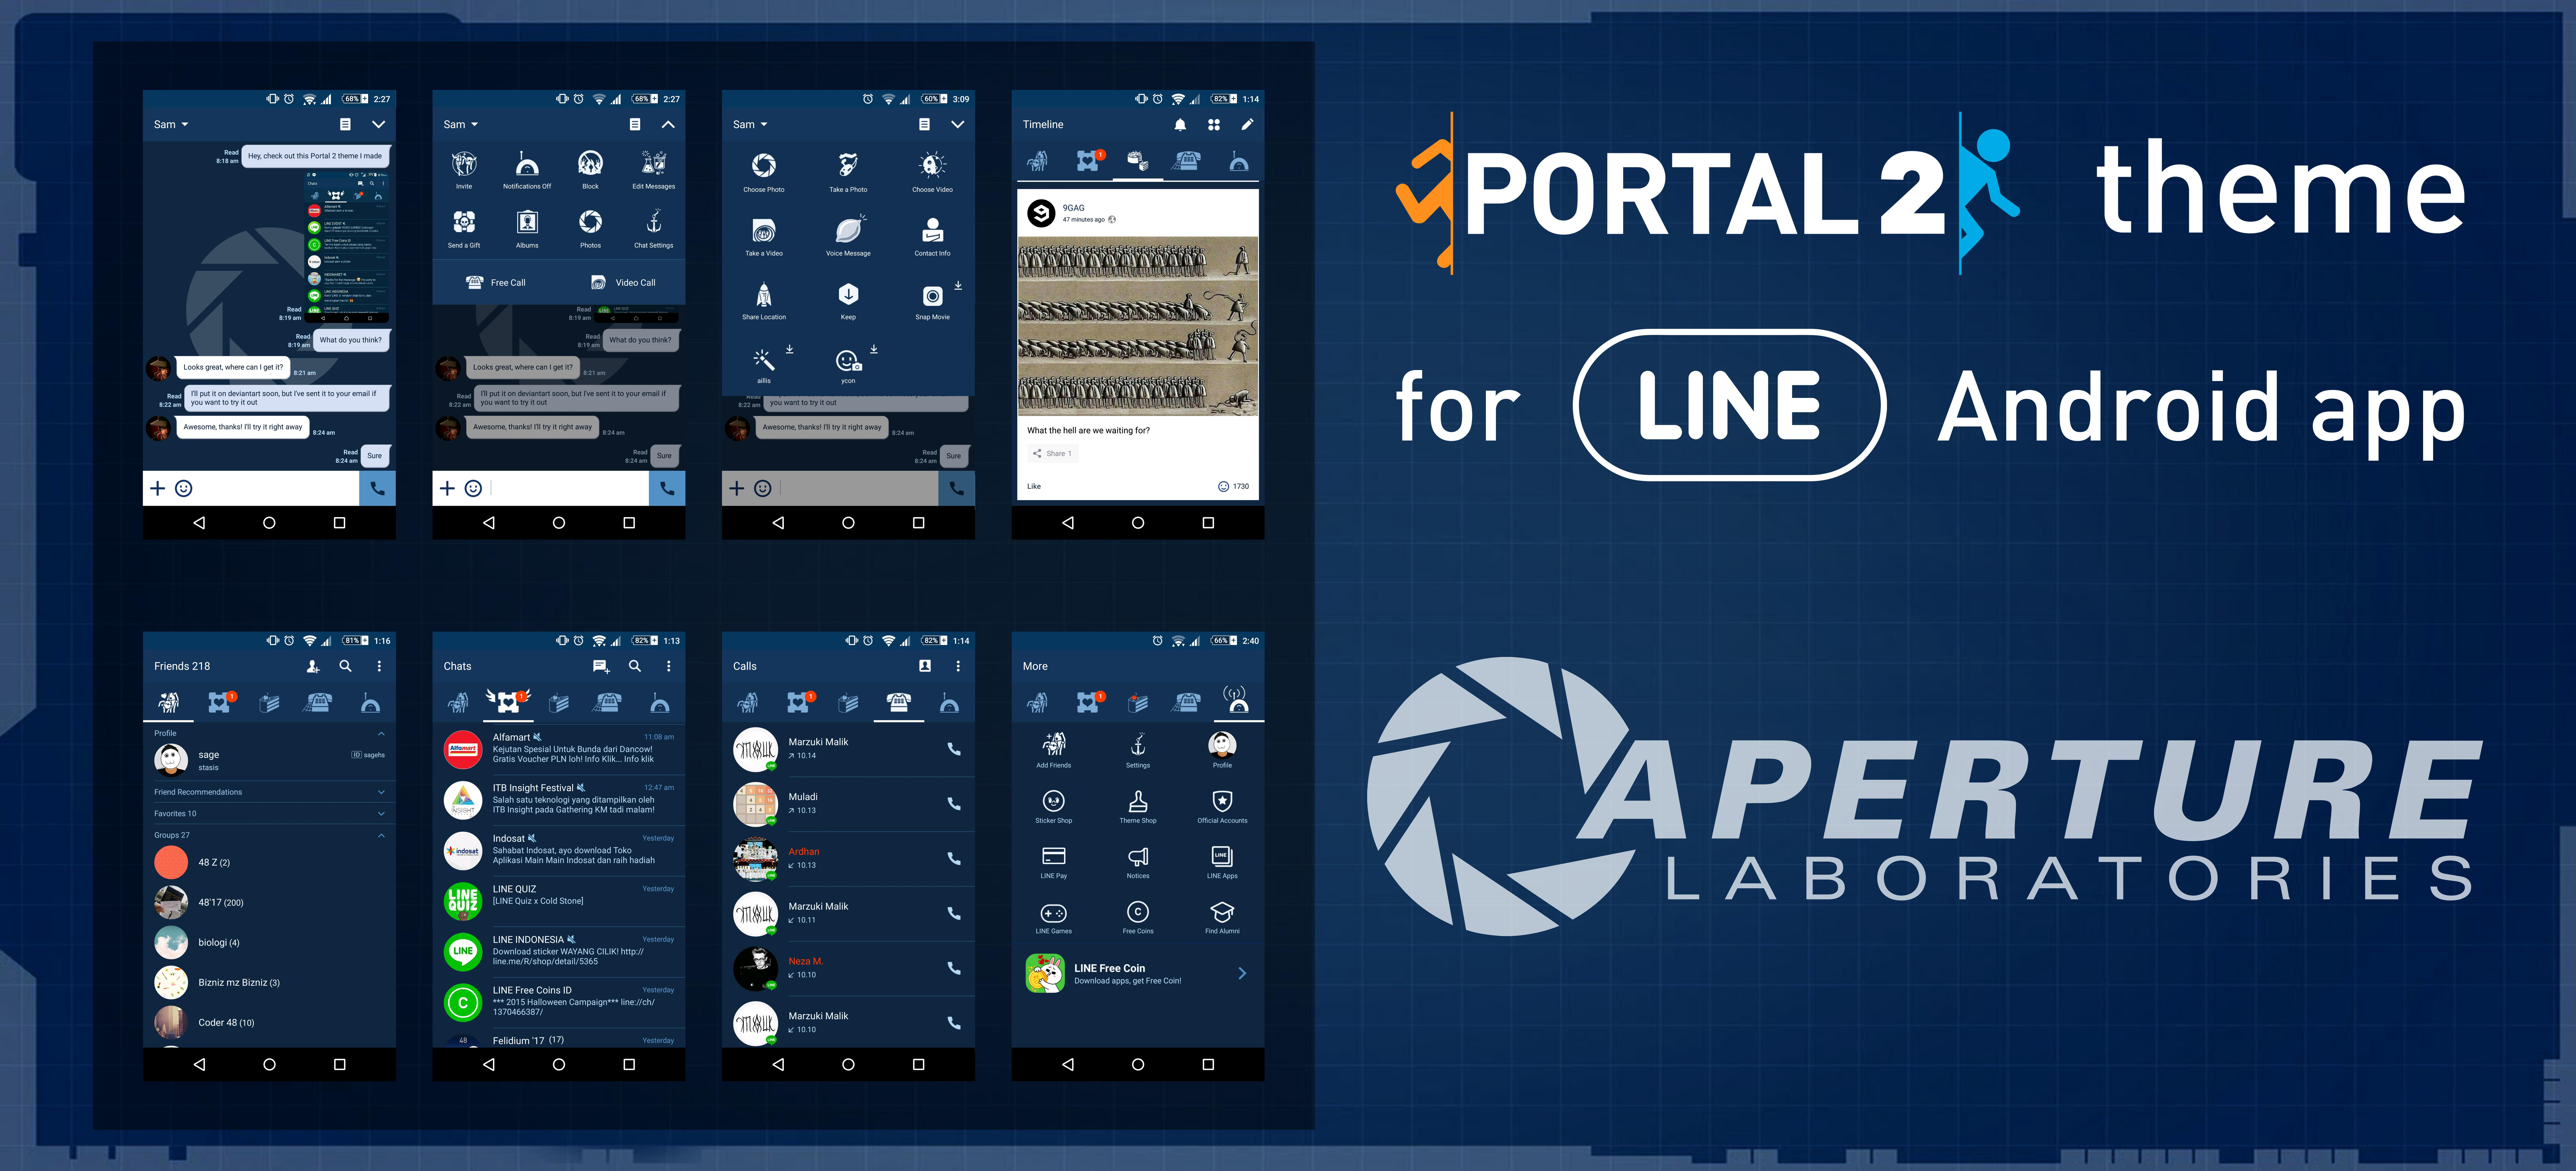 obsolete] Portal 2 LINE Theme – laymonage's site